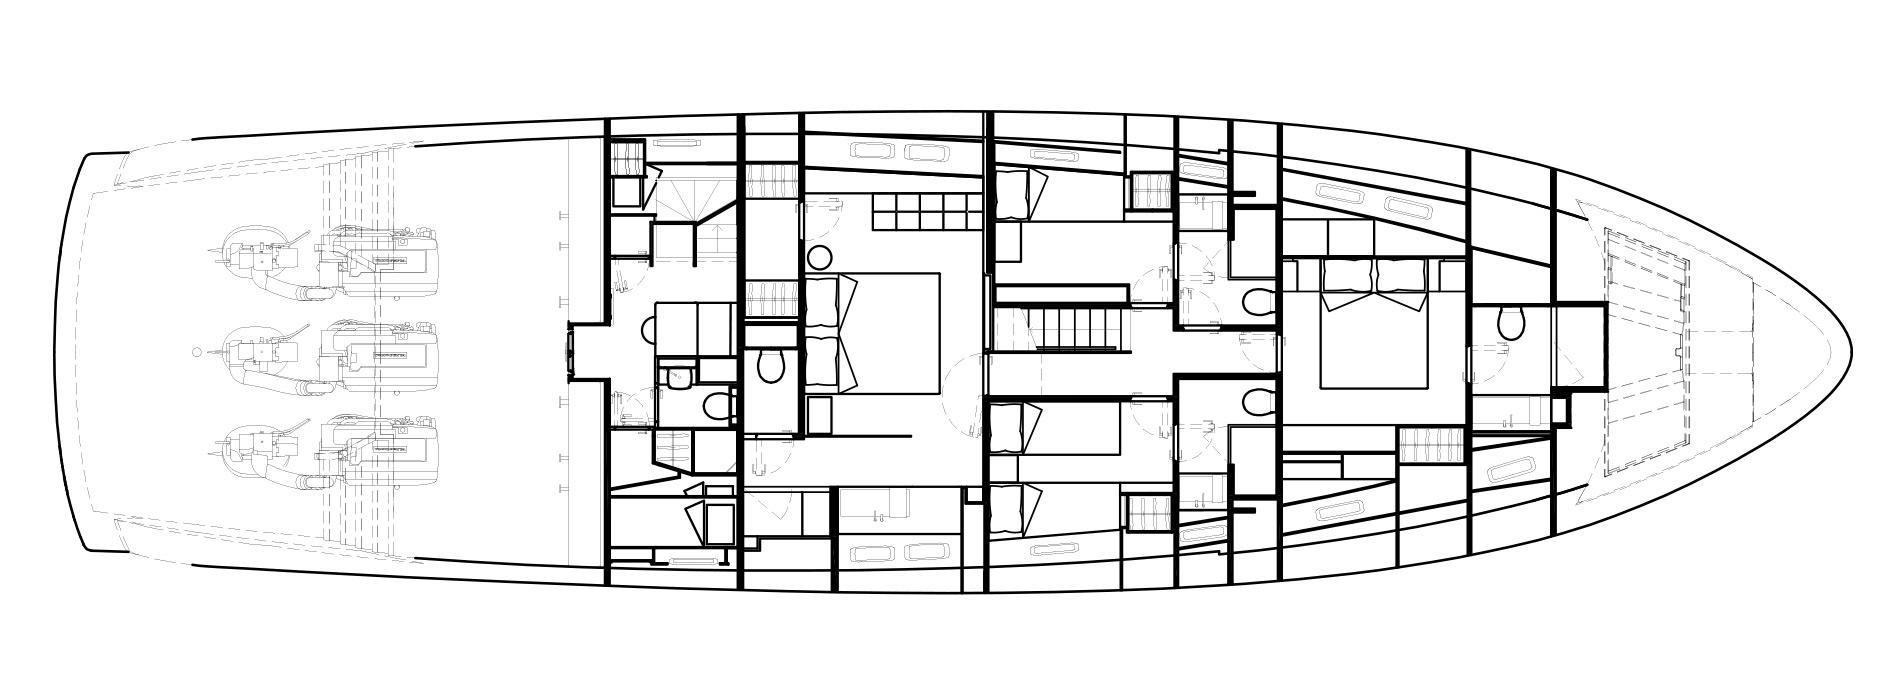 Sanlorenzo Yachts SX88 Lower Deck Version Lissoni